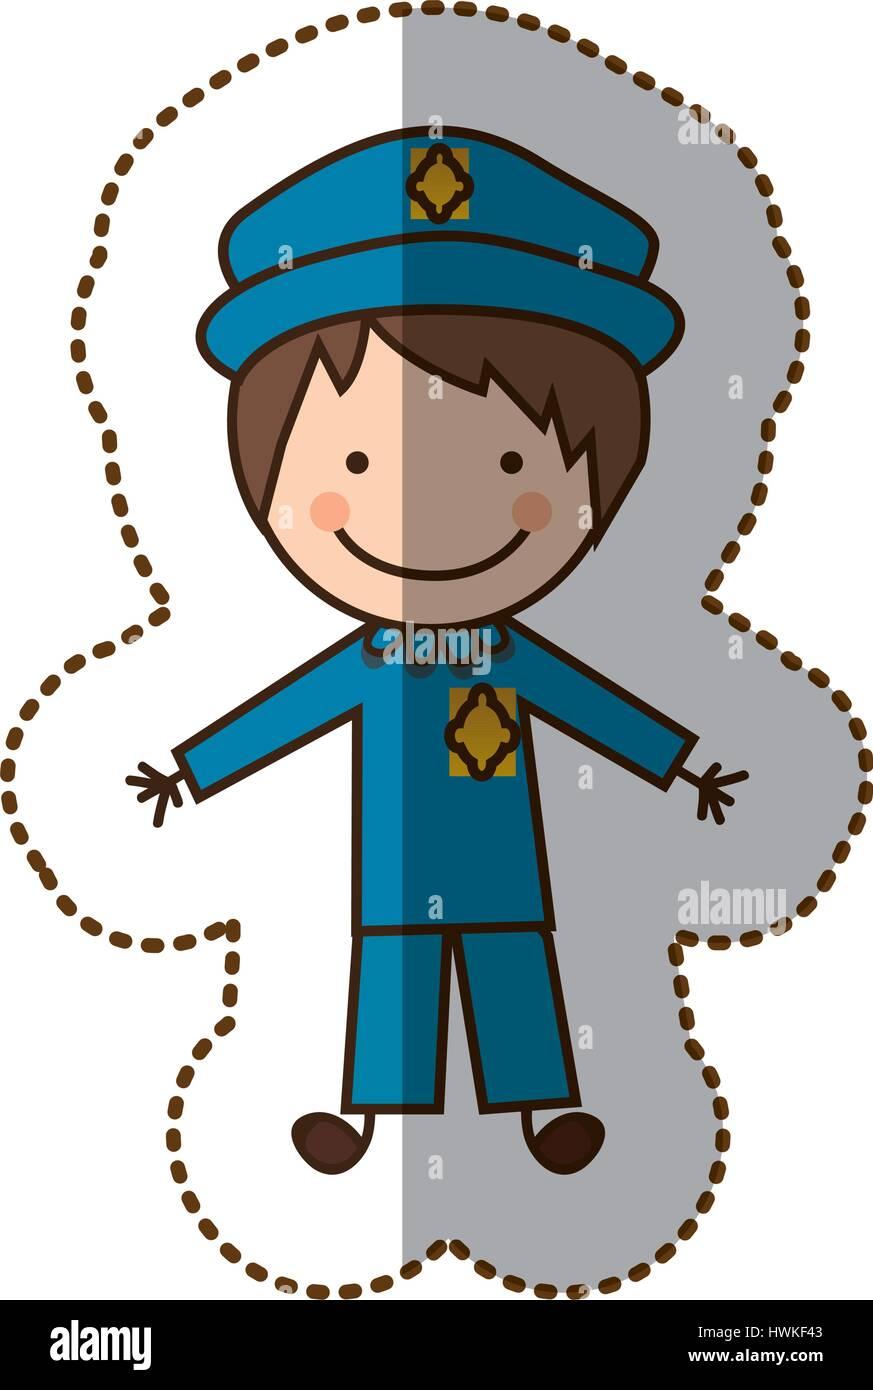 happy man police icon - Stock Image